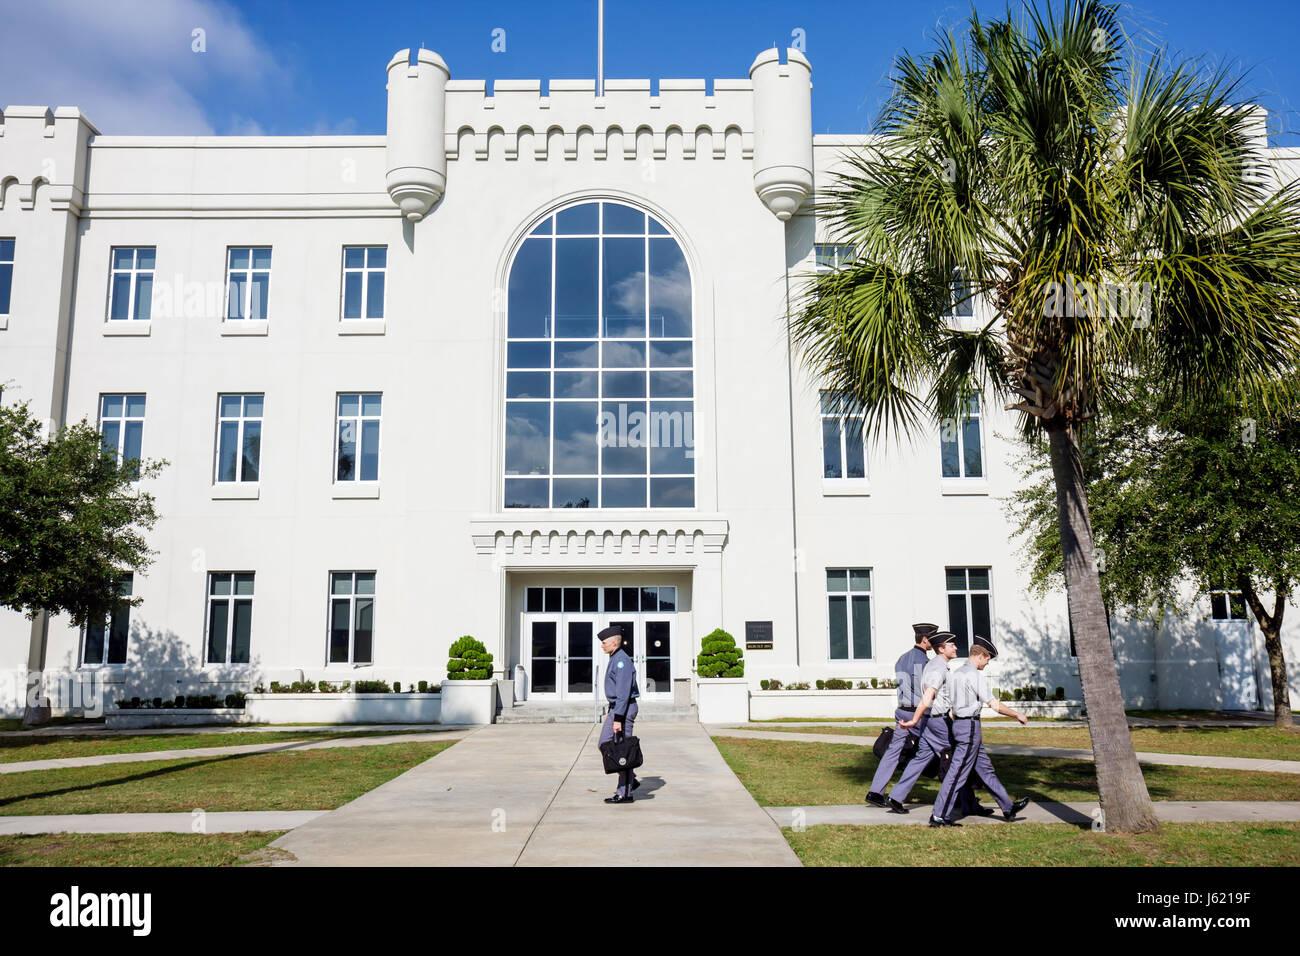 Charleston South Carolina The Citadel The Military College